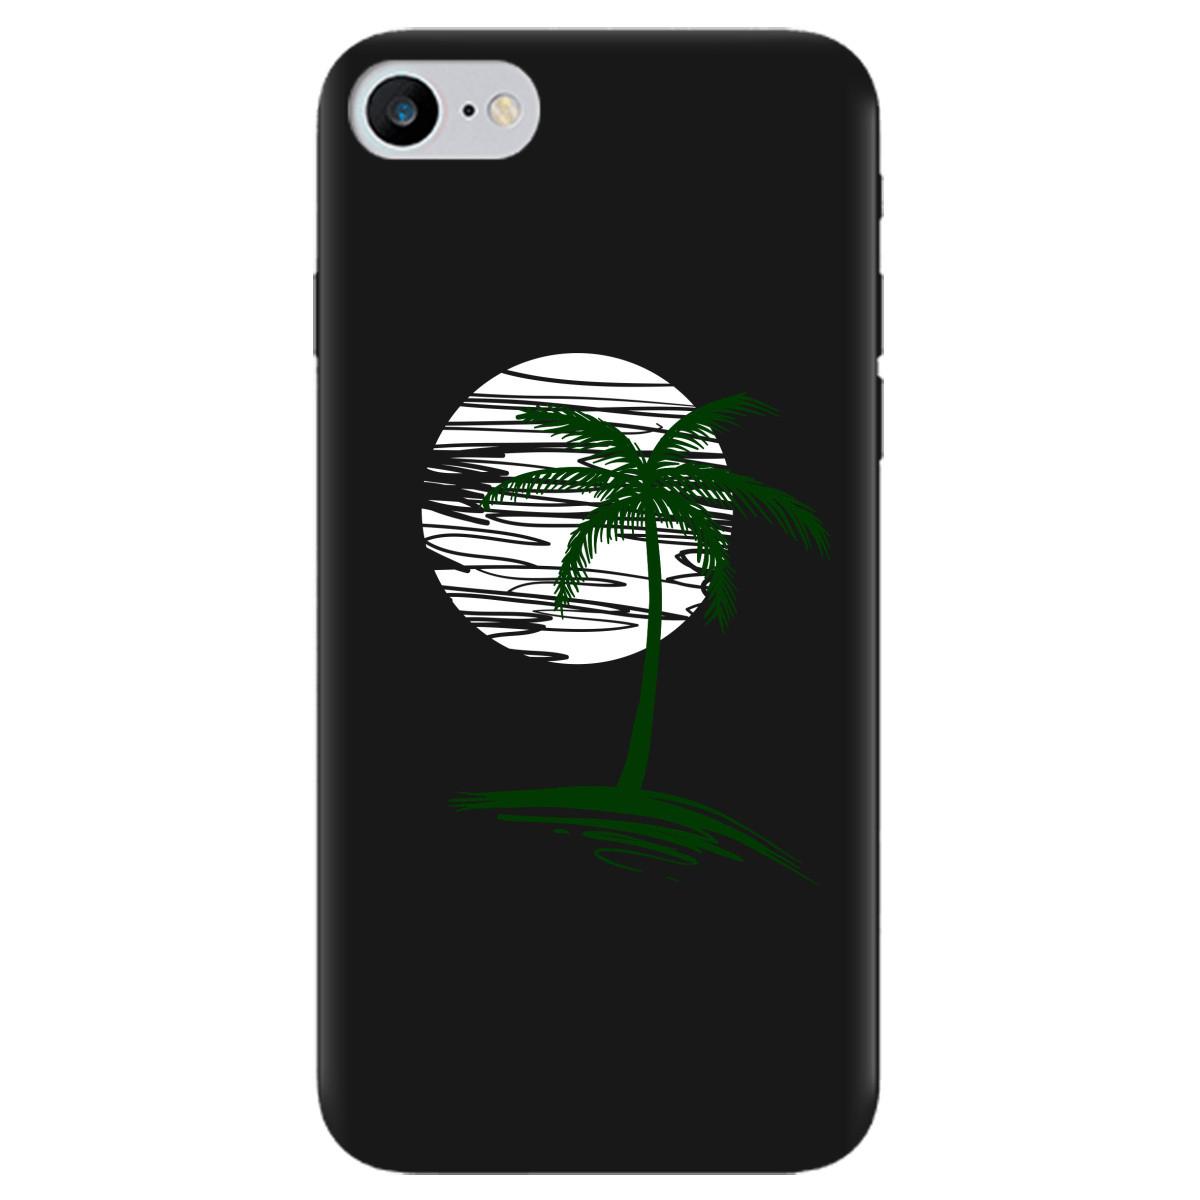 Чохол для Apple iPhone 7 чорний матовий soft touch Sunset